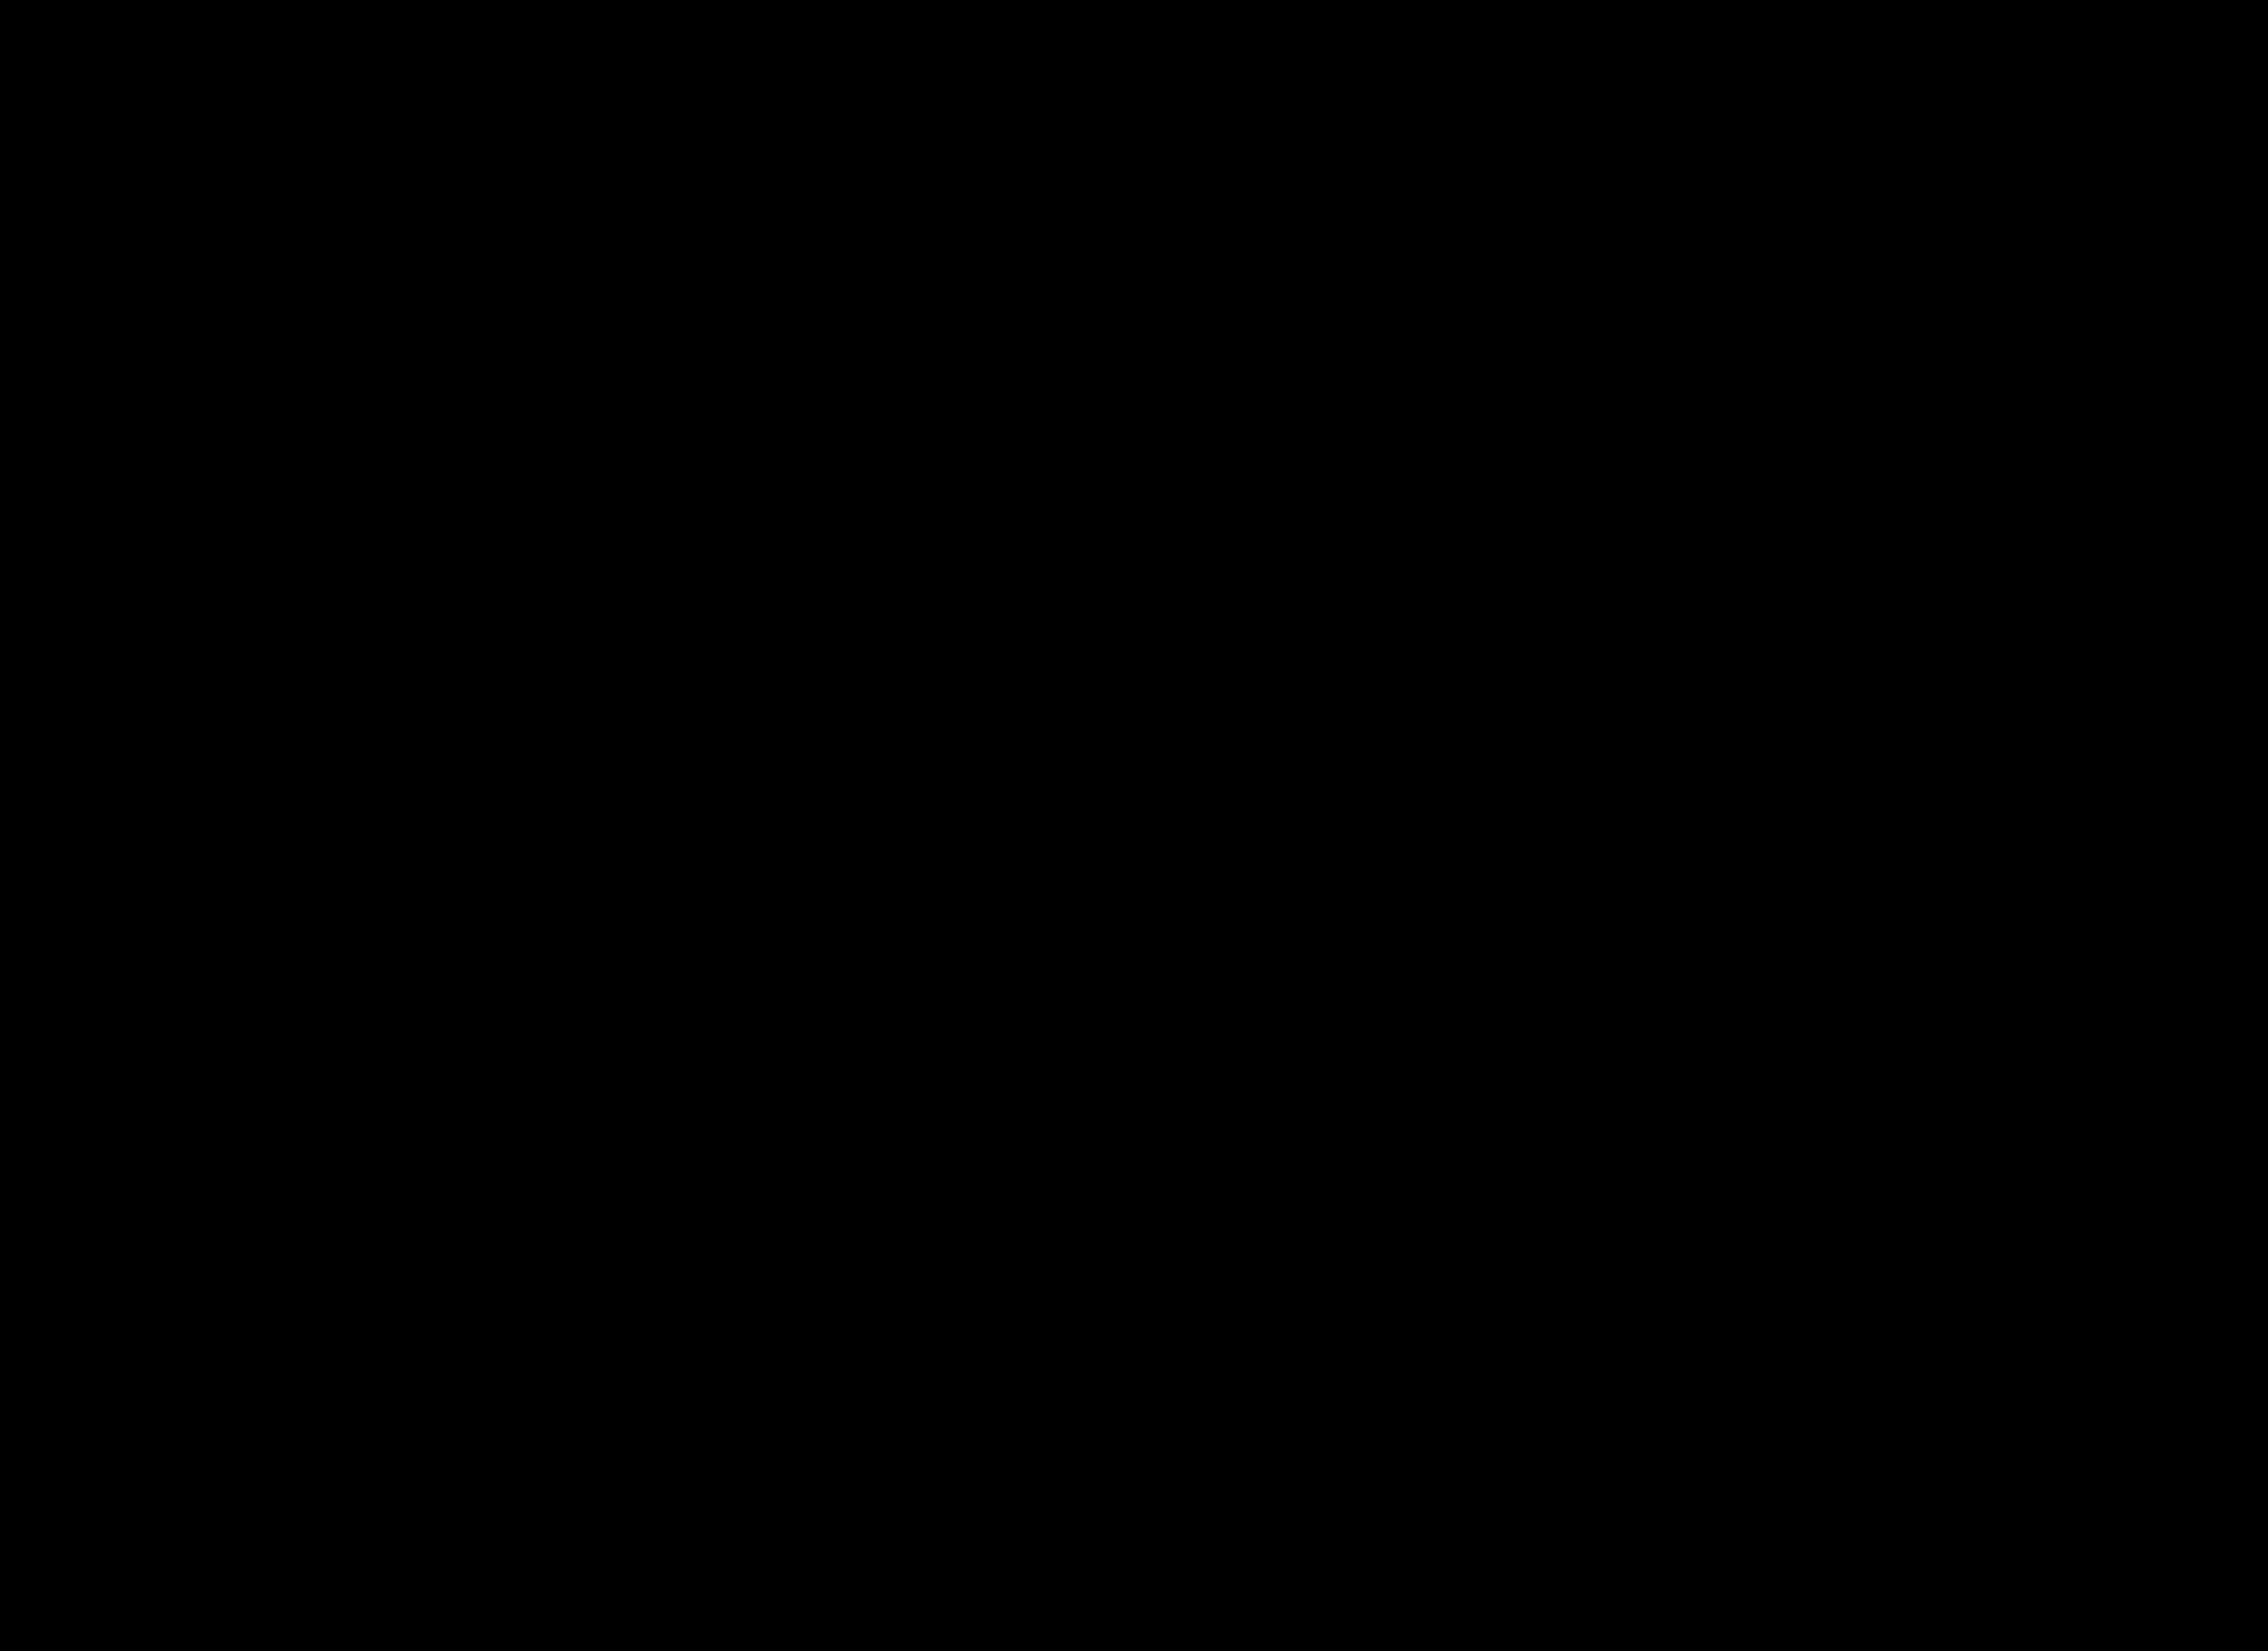 7 Noise Texture Overlays (PNG Transparent).